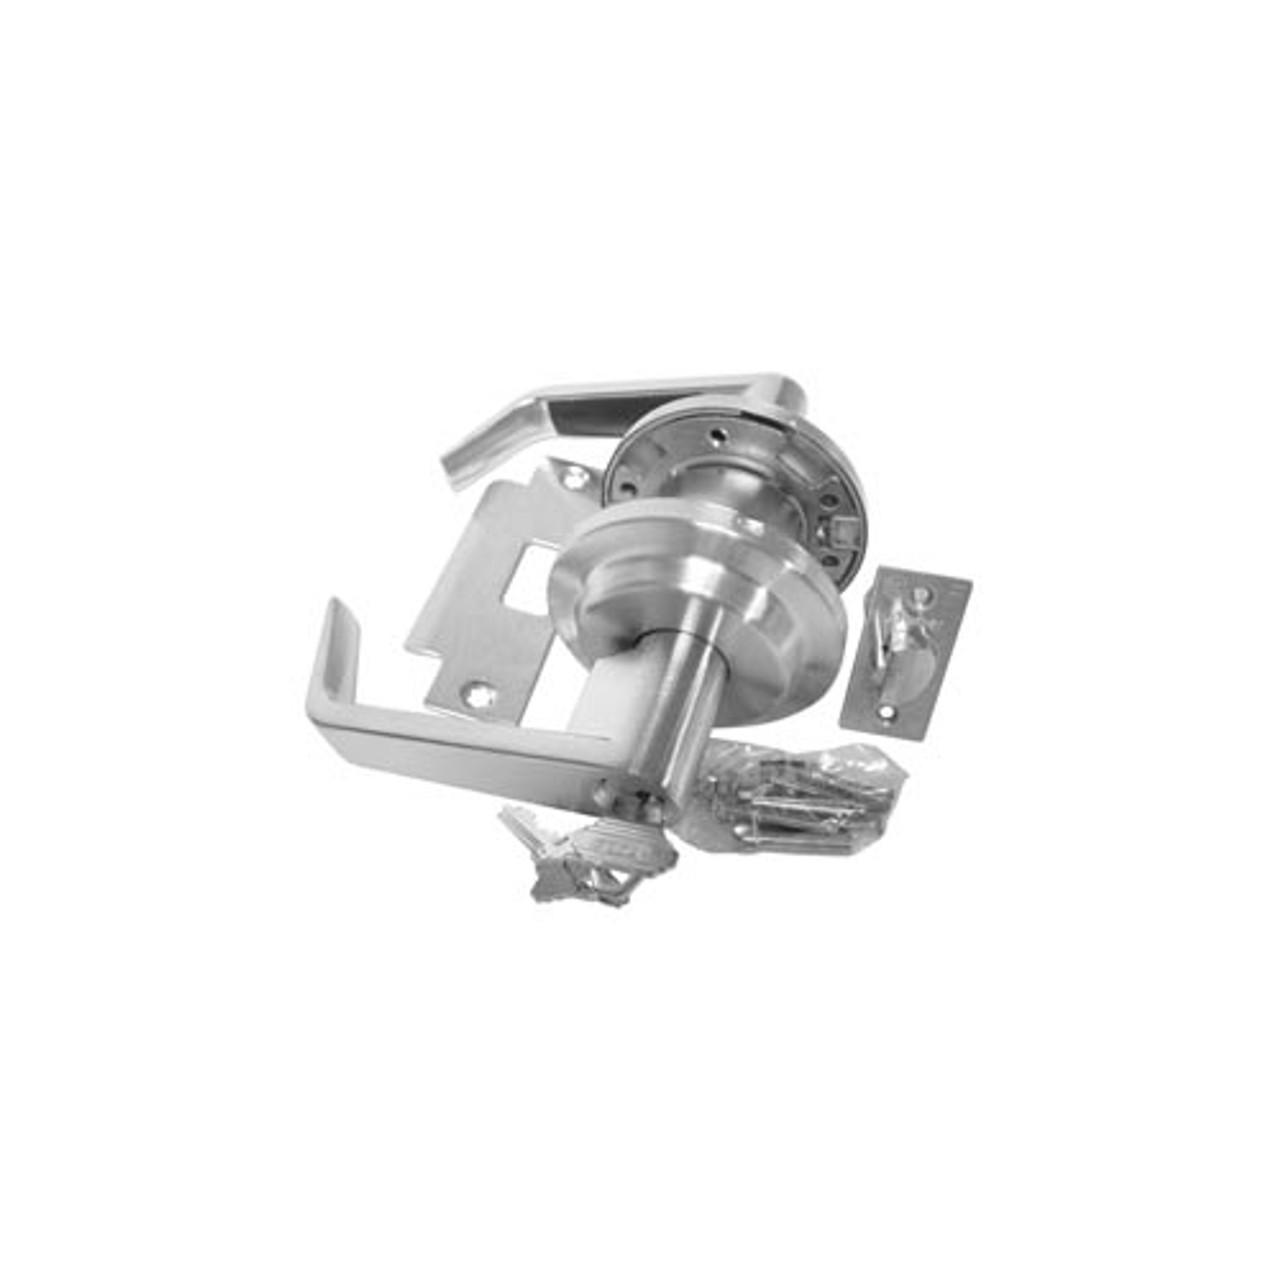 Parker Hardware # 4 Aluminum Heavy Duty Door Closer S